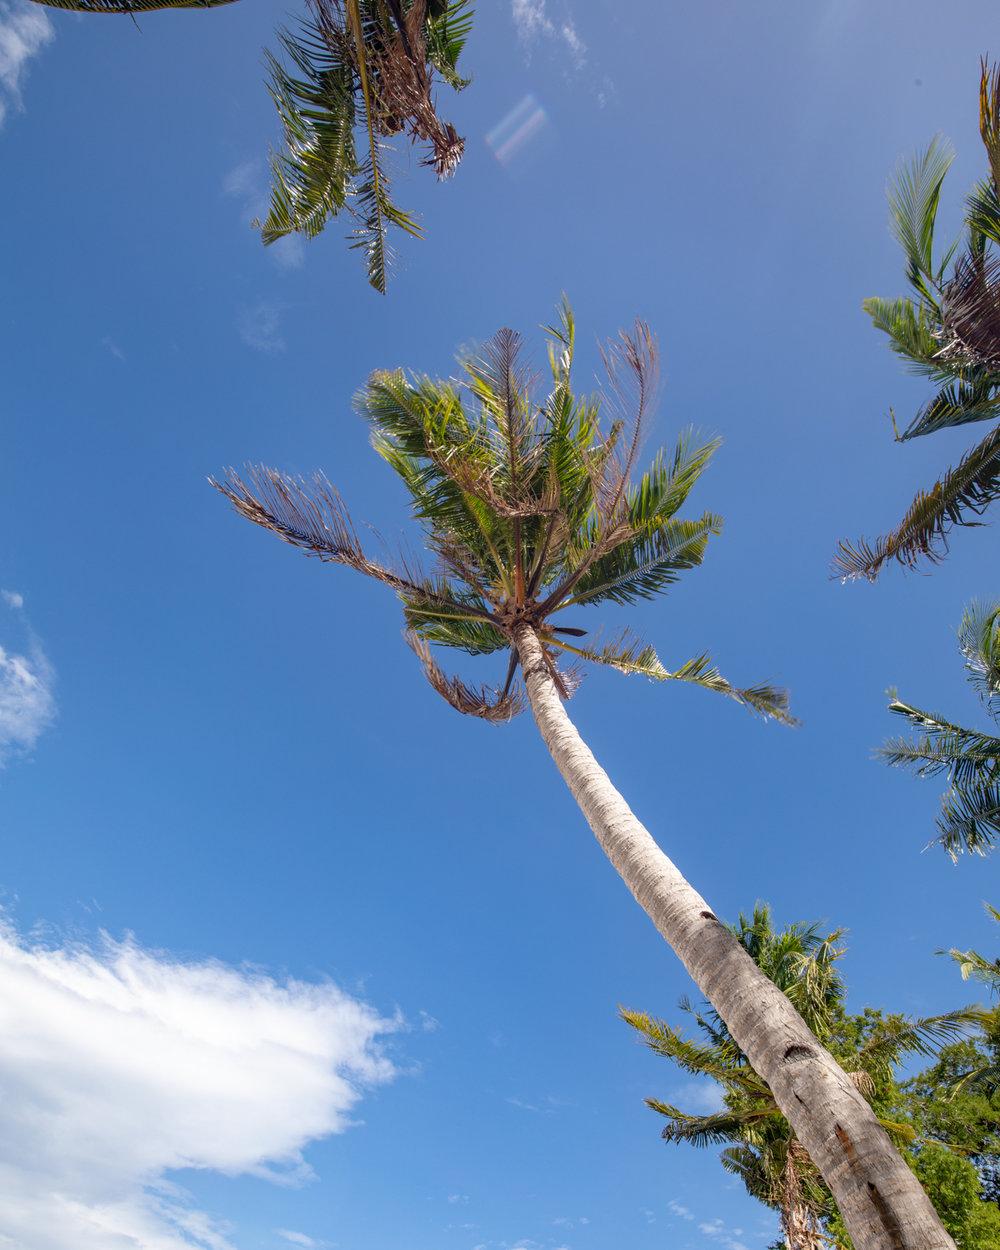 Palm Tree Views on Banana Island